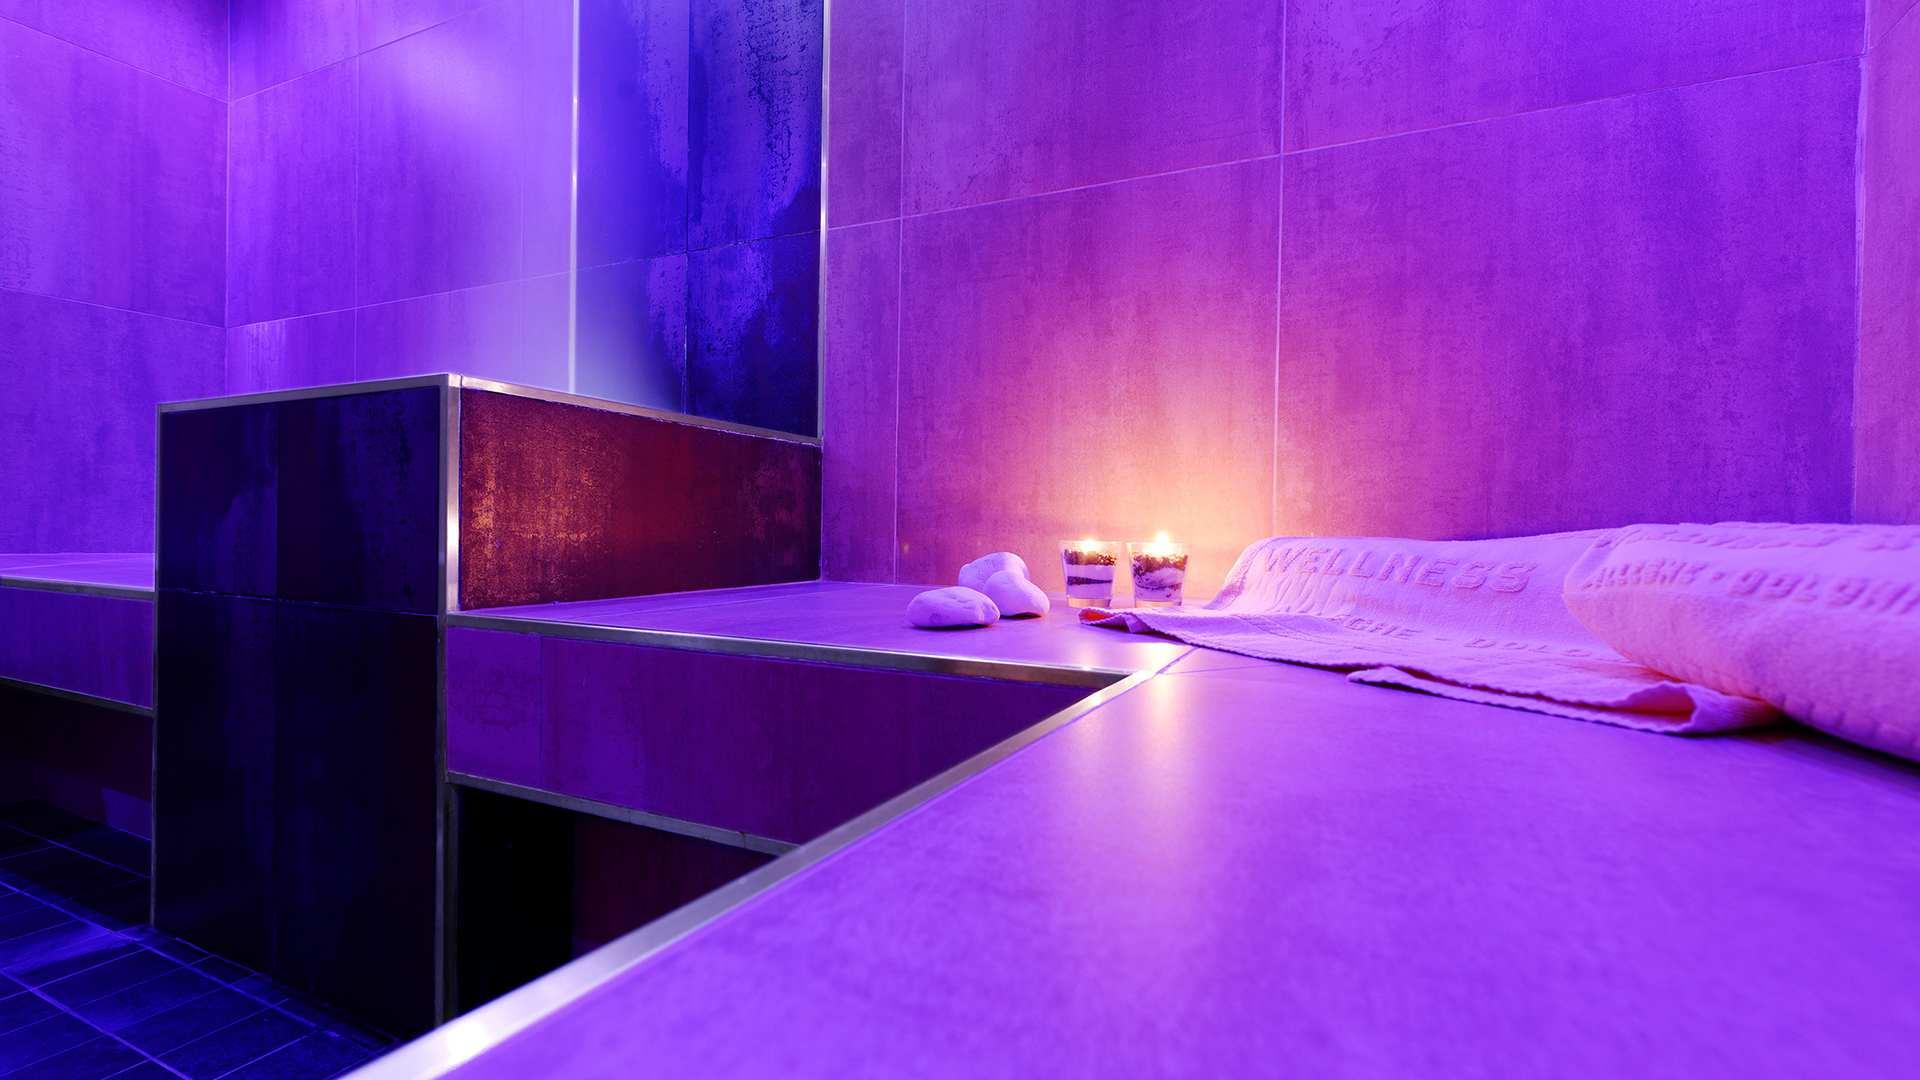 ROMANTIC DREAM  7 6 - Offer -   hotelname  c8b741de88fe